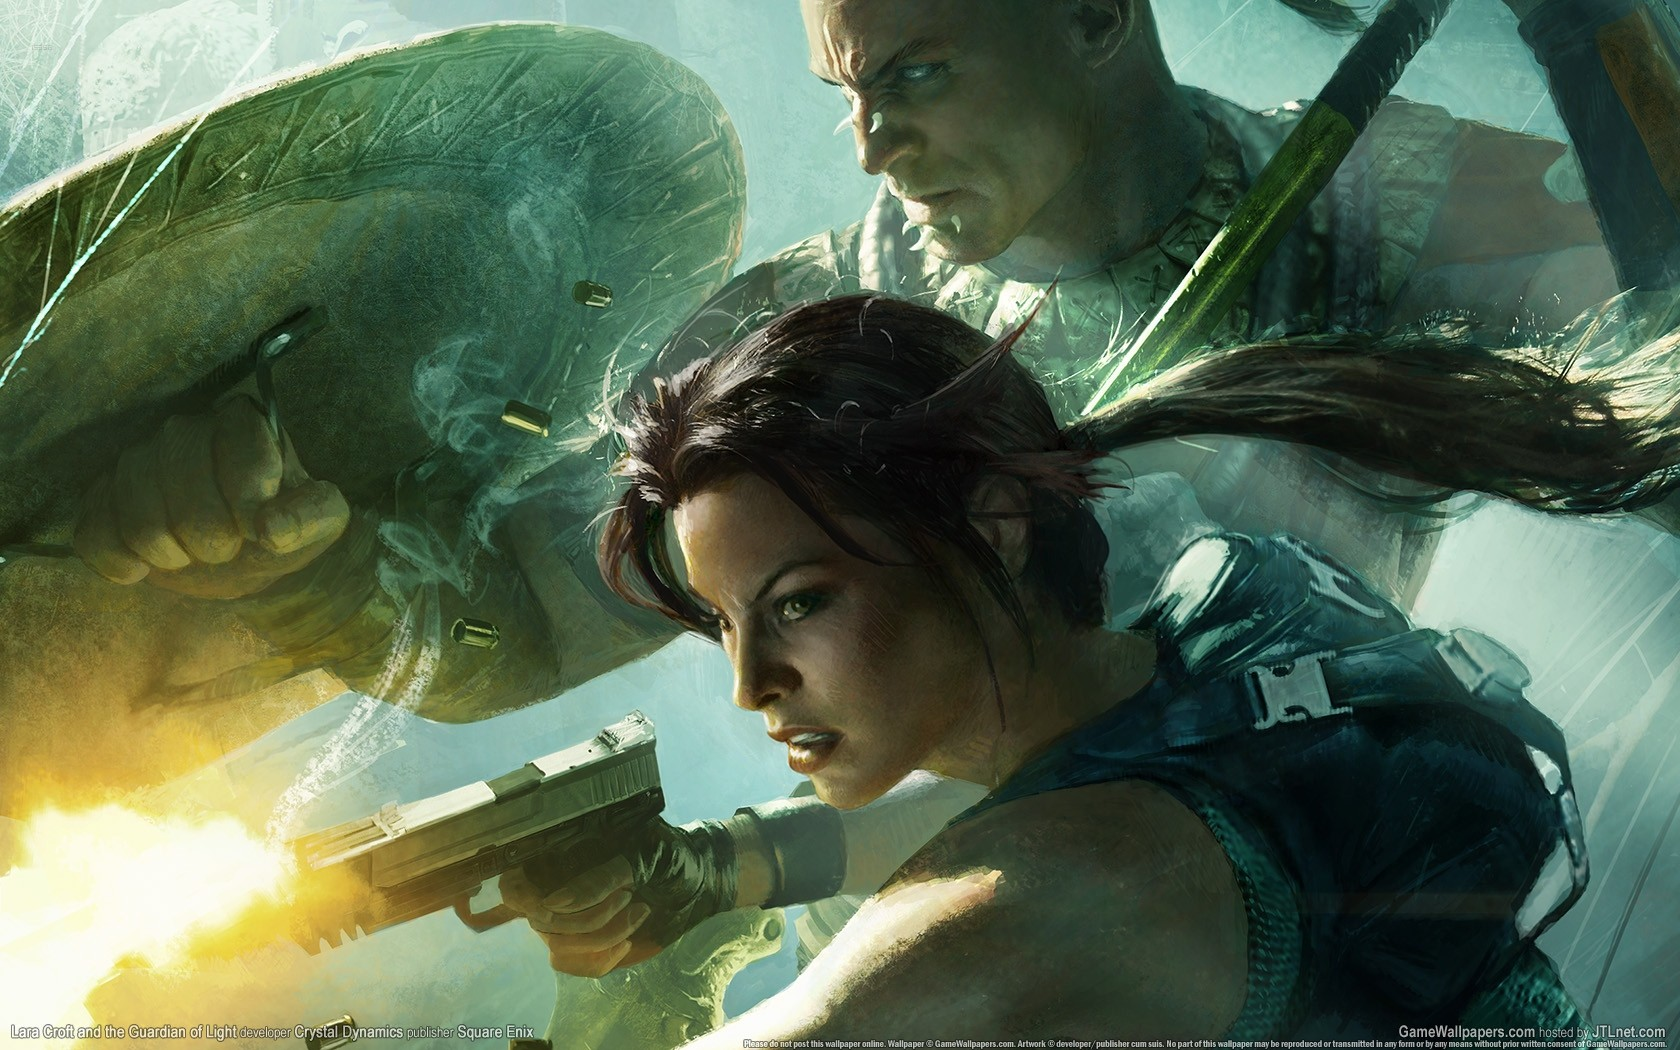 wallpaper_lara_croft_and_the_guardian_of_light_01_1680x1050.jpg - Lara Croft and the Guardian of Light